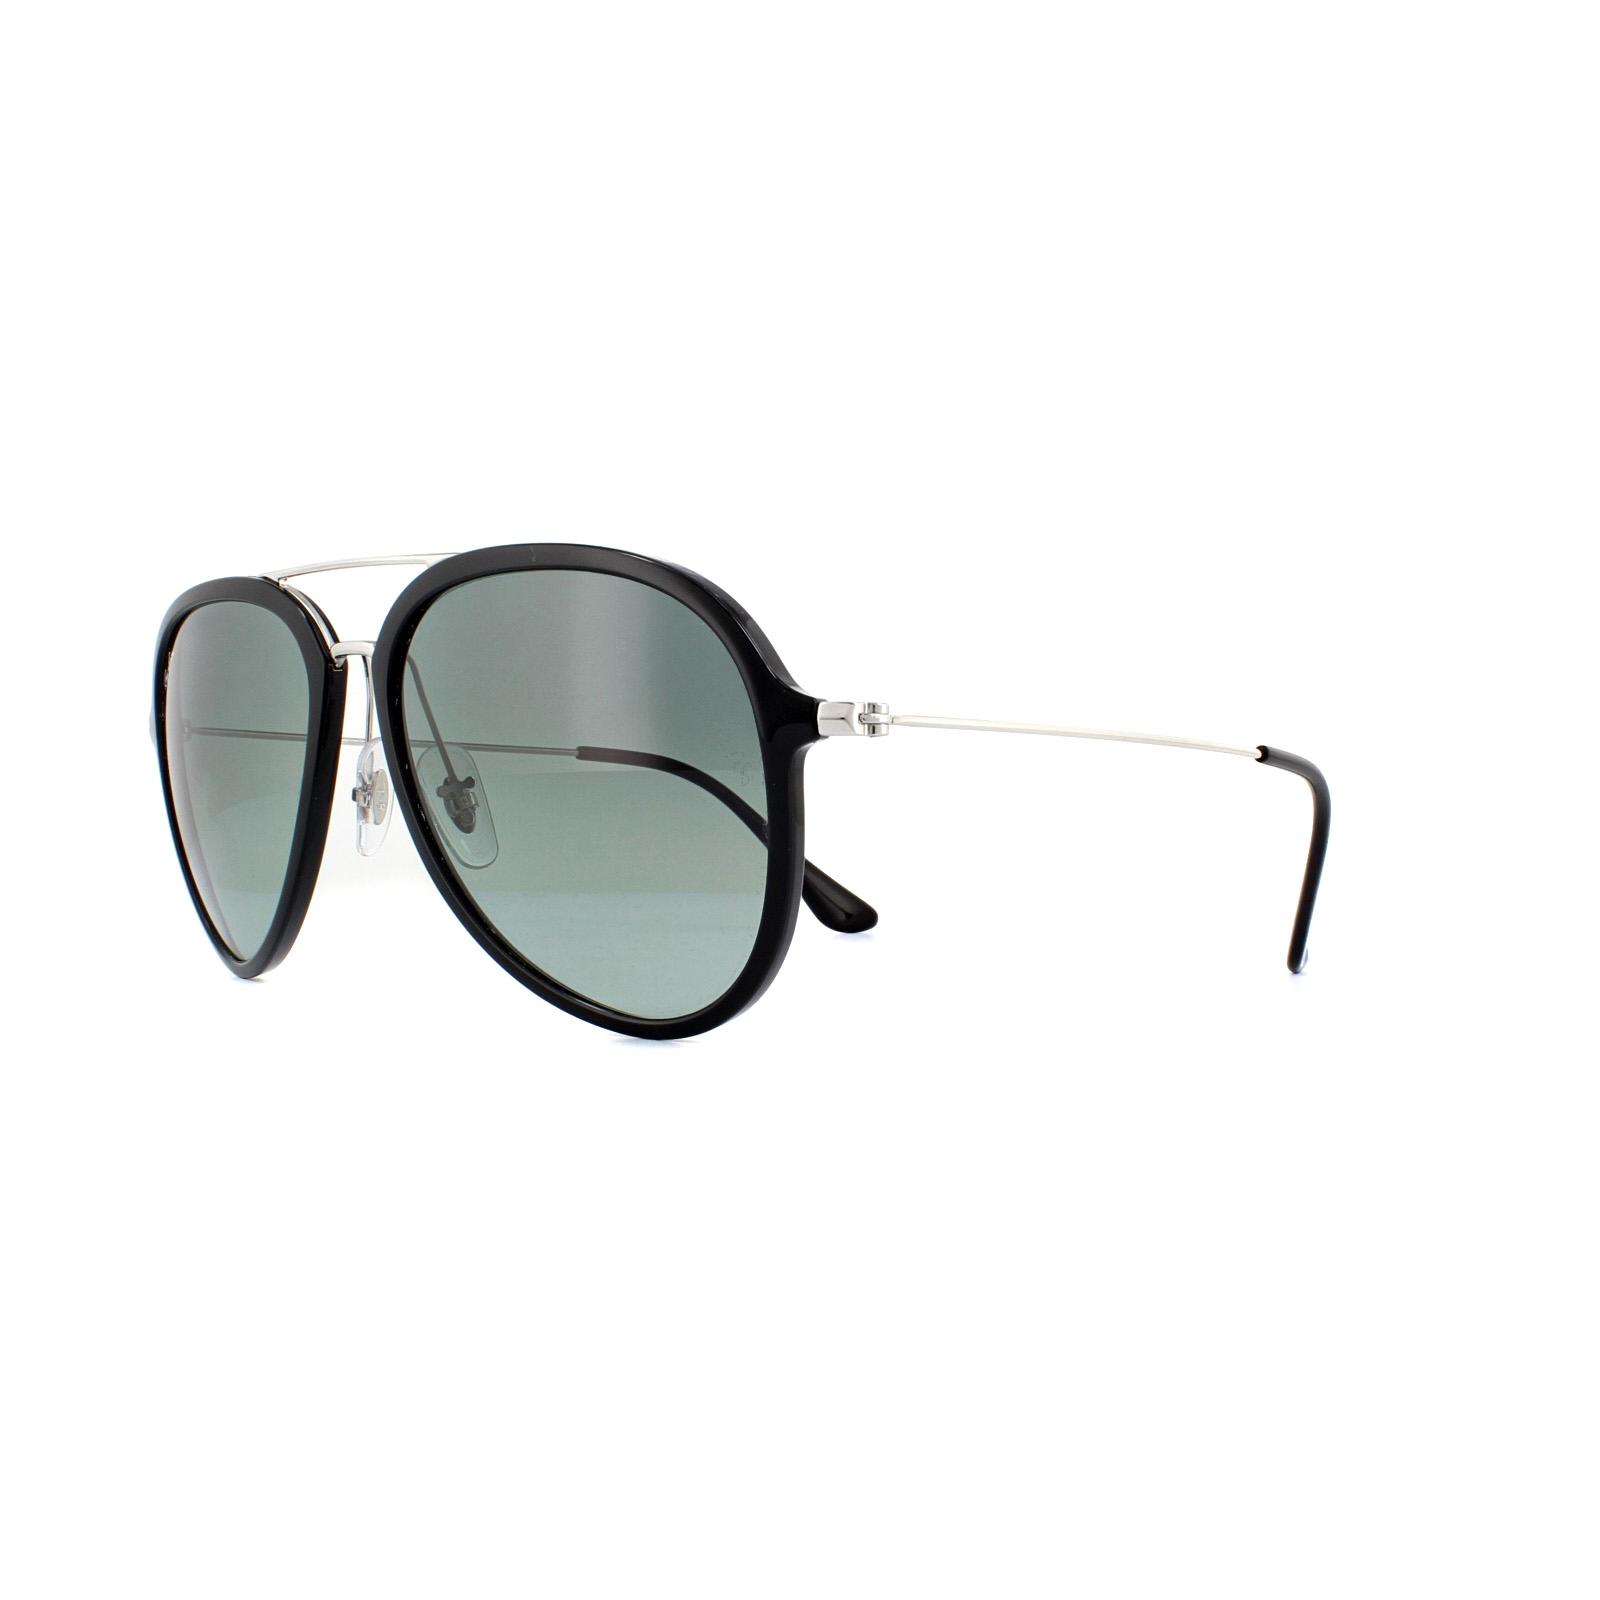 e3ff1cff3b Ray-Ban Sunglasses RB4298 601 71 Black Grey Gradient 8053672866216 ...